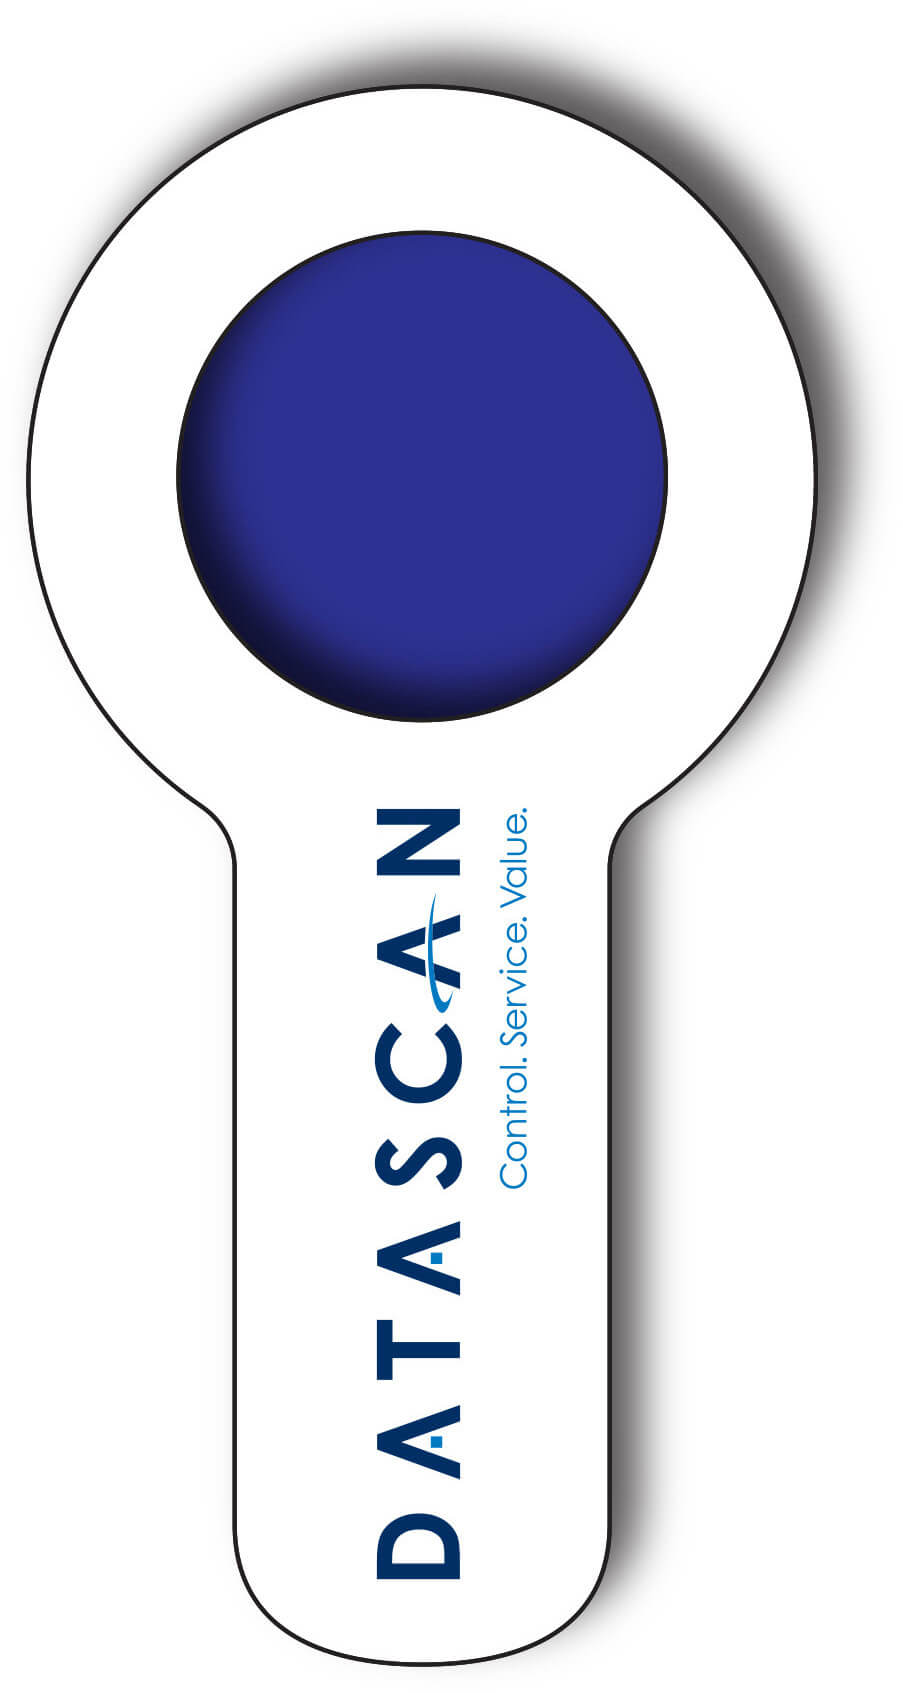 datascan_custom_spyglass